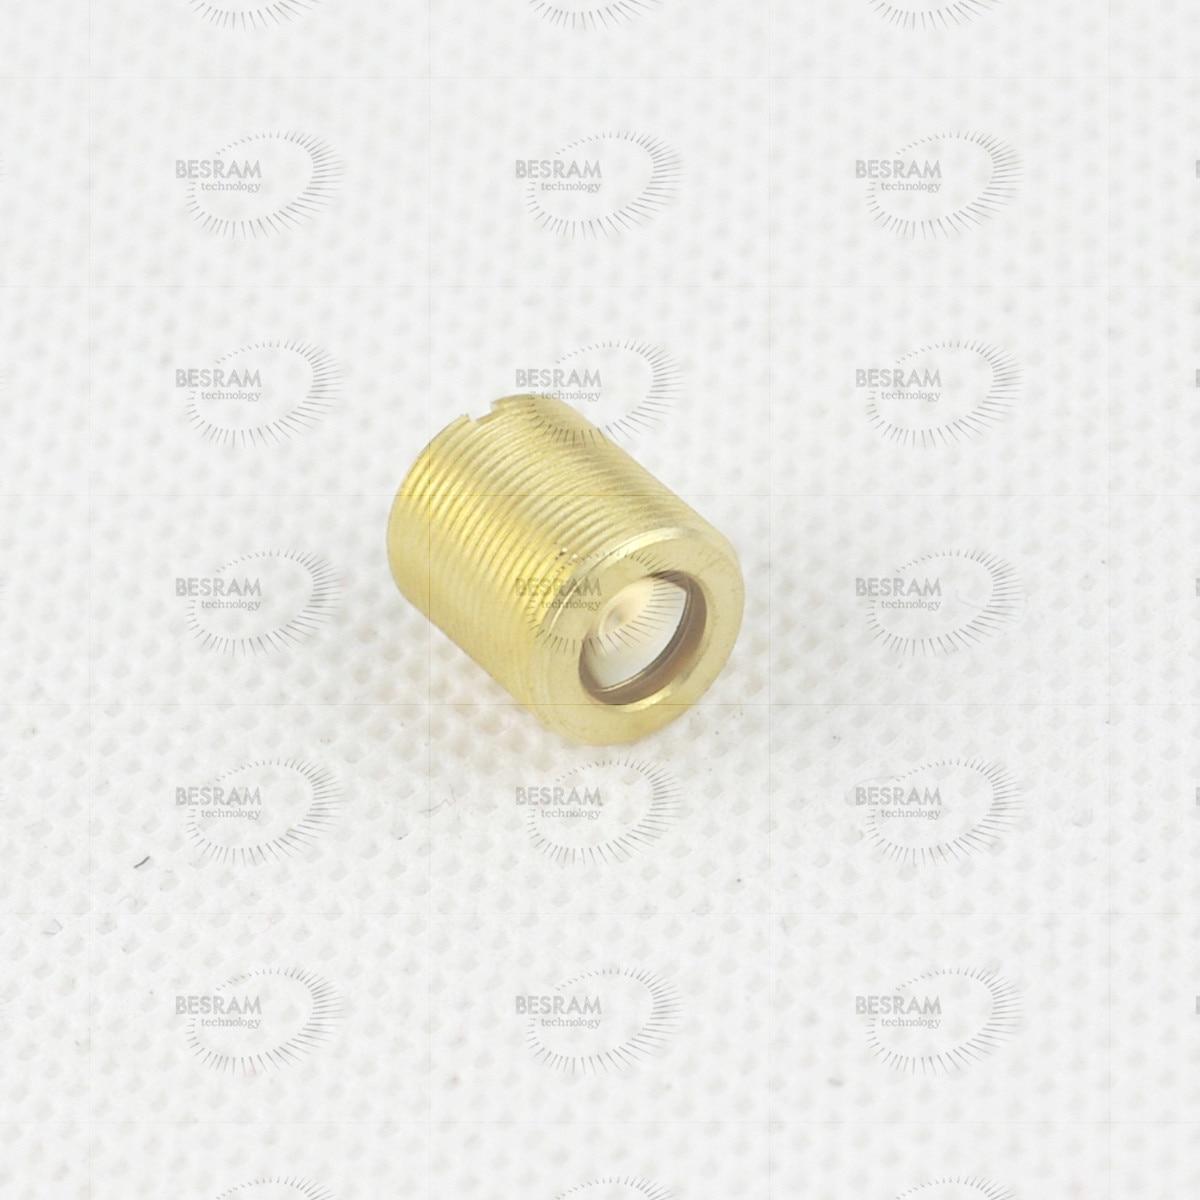 2pcs 400-700nm G2 Focal Lens Collimation Lens Coated Glass Lens F RGB Laser M9/P0.5 Frame